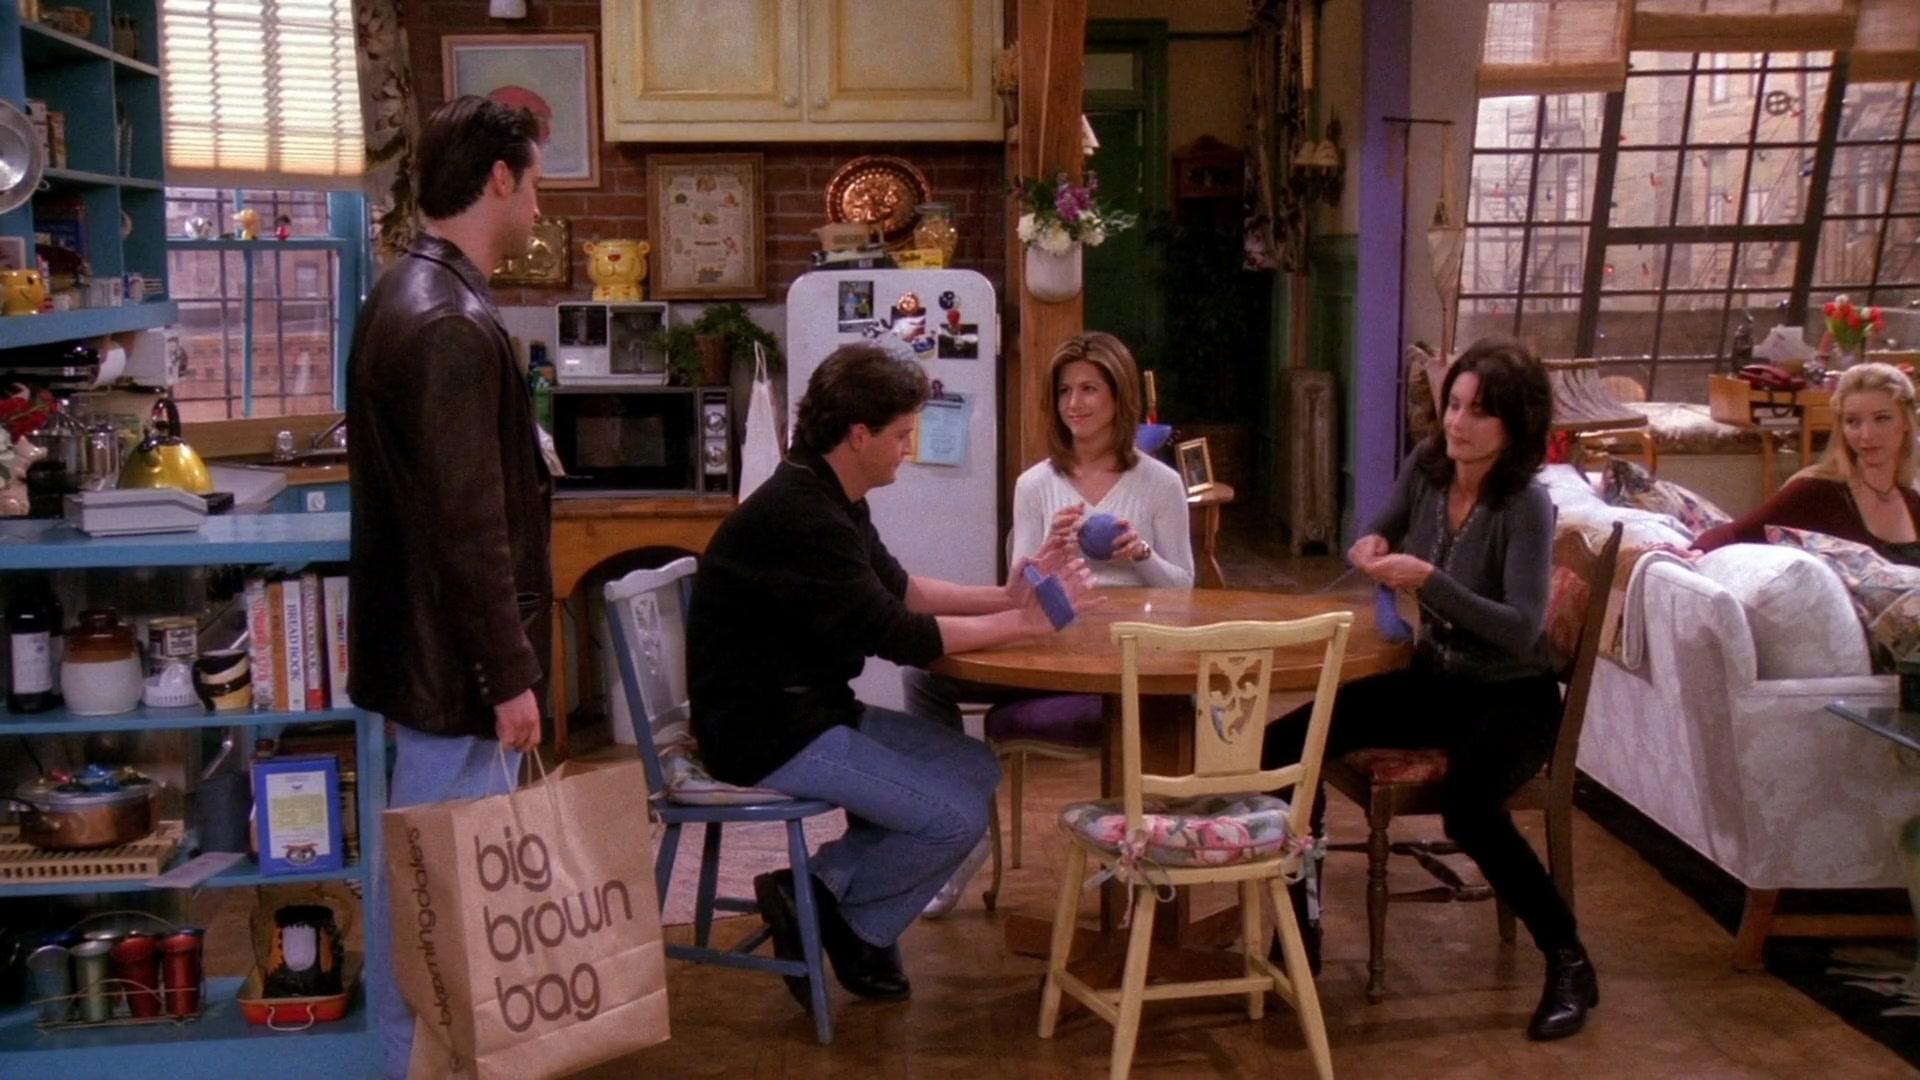 9dff4f3c8d6 Bloomingdale s Store Big Brown Bag Held by Matt LeBlanc (Joey Tribbiani) in  Friends Season